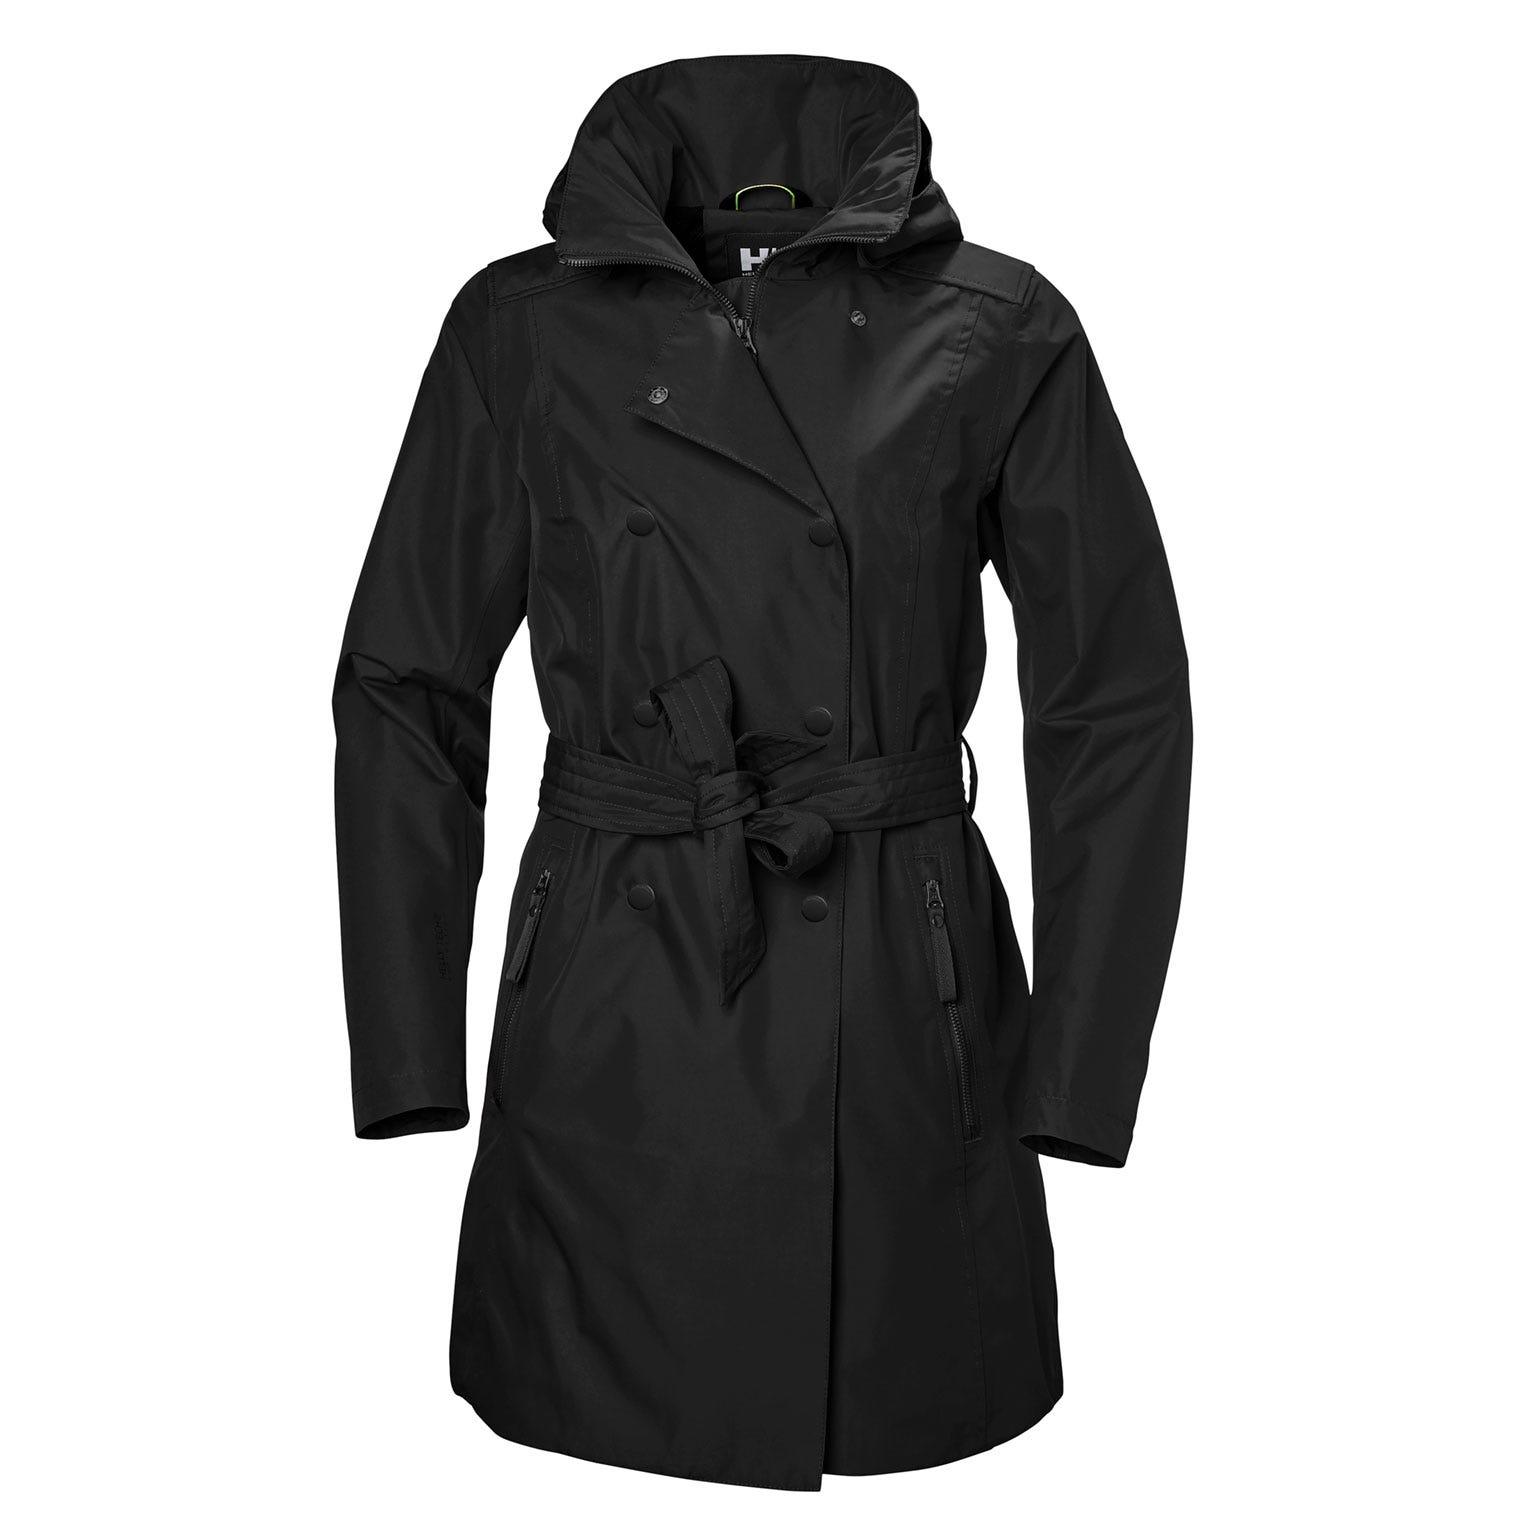 Womens Welsey Ii Updated Trench Coat | Helly Hansen Womens Rain Jacket XL